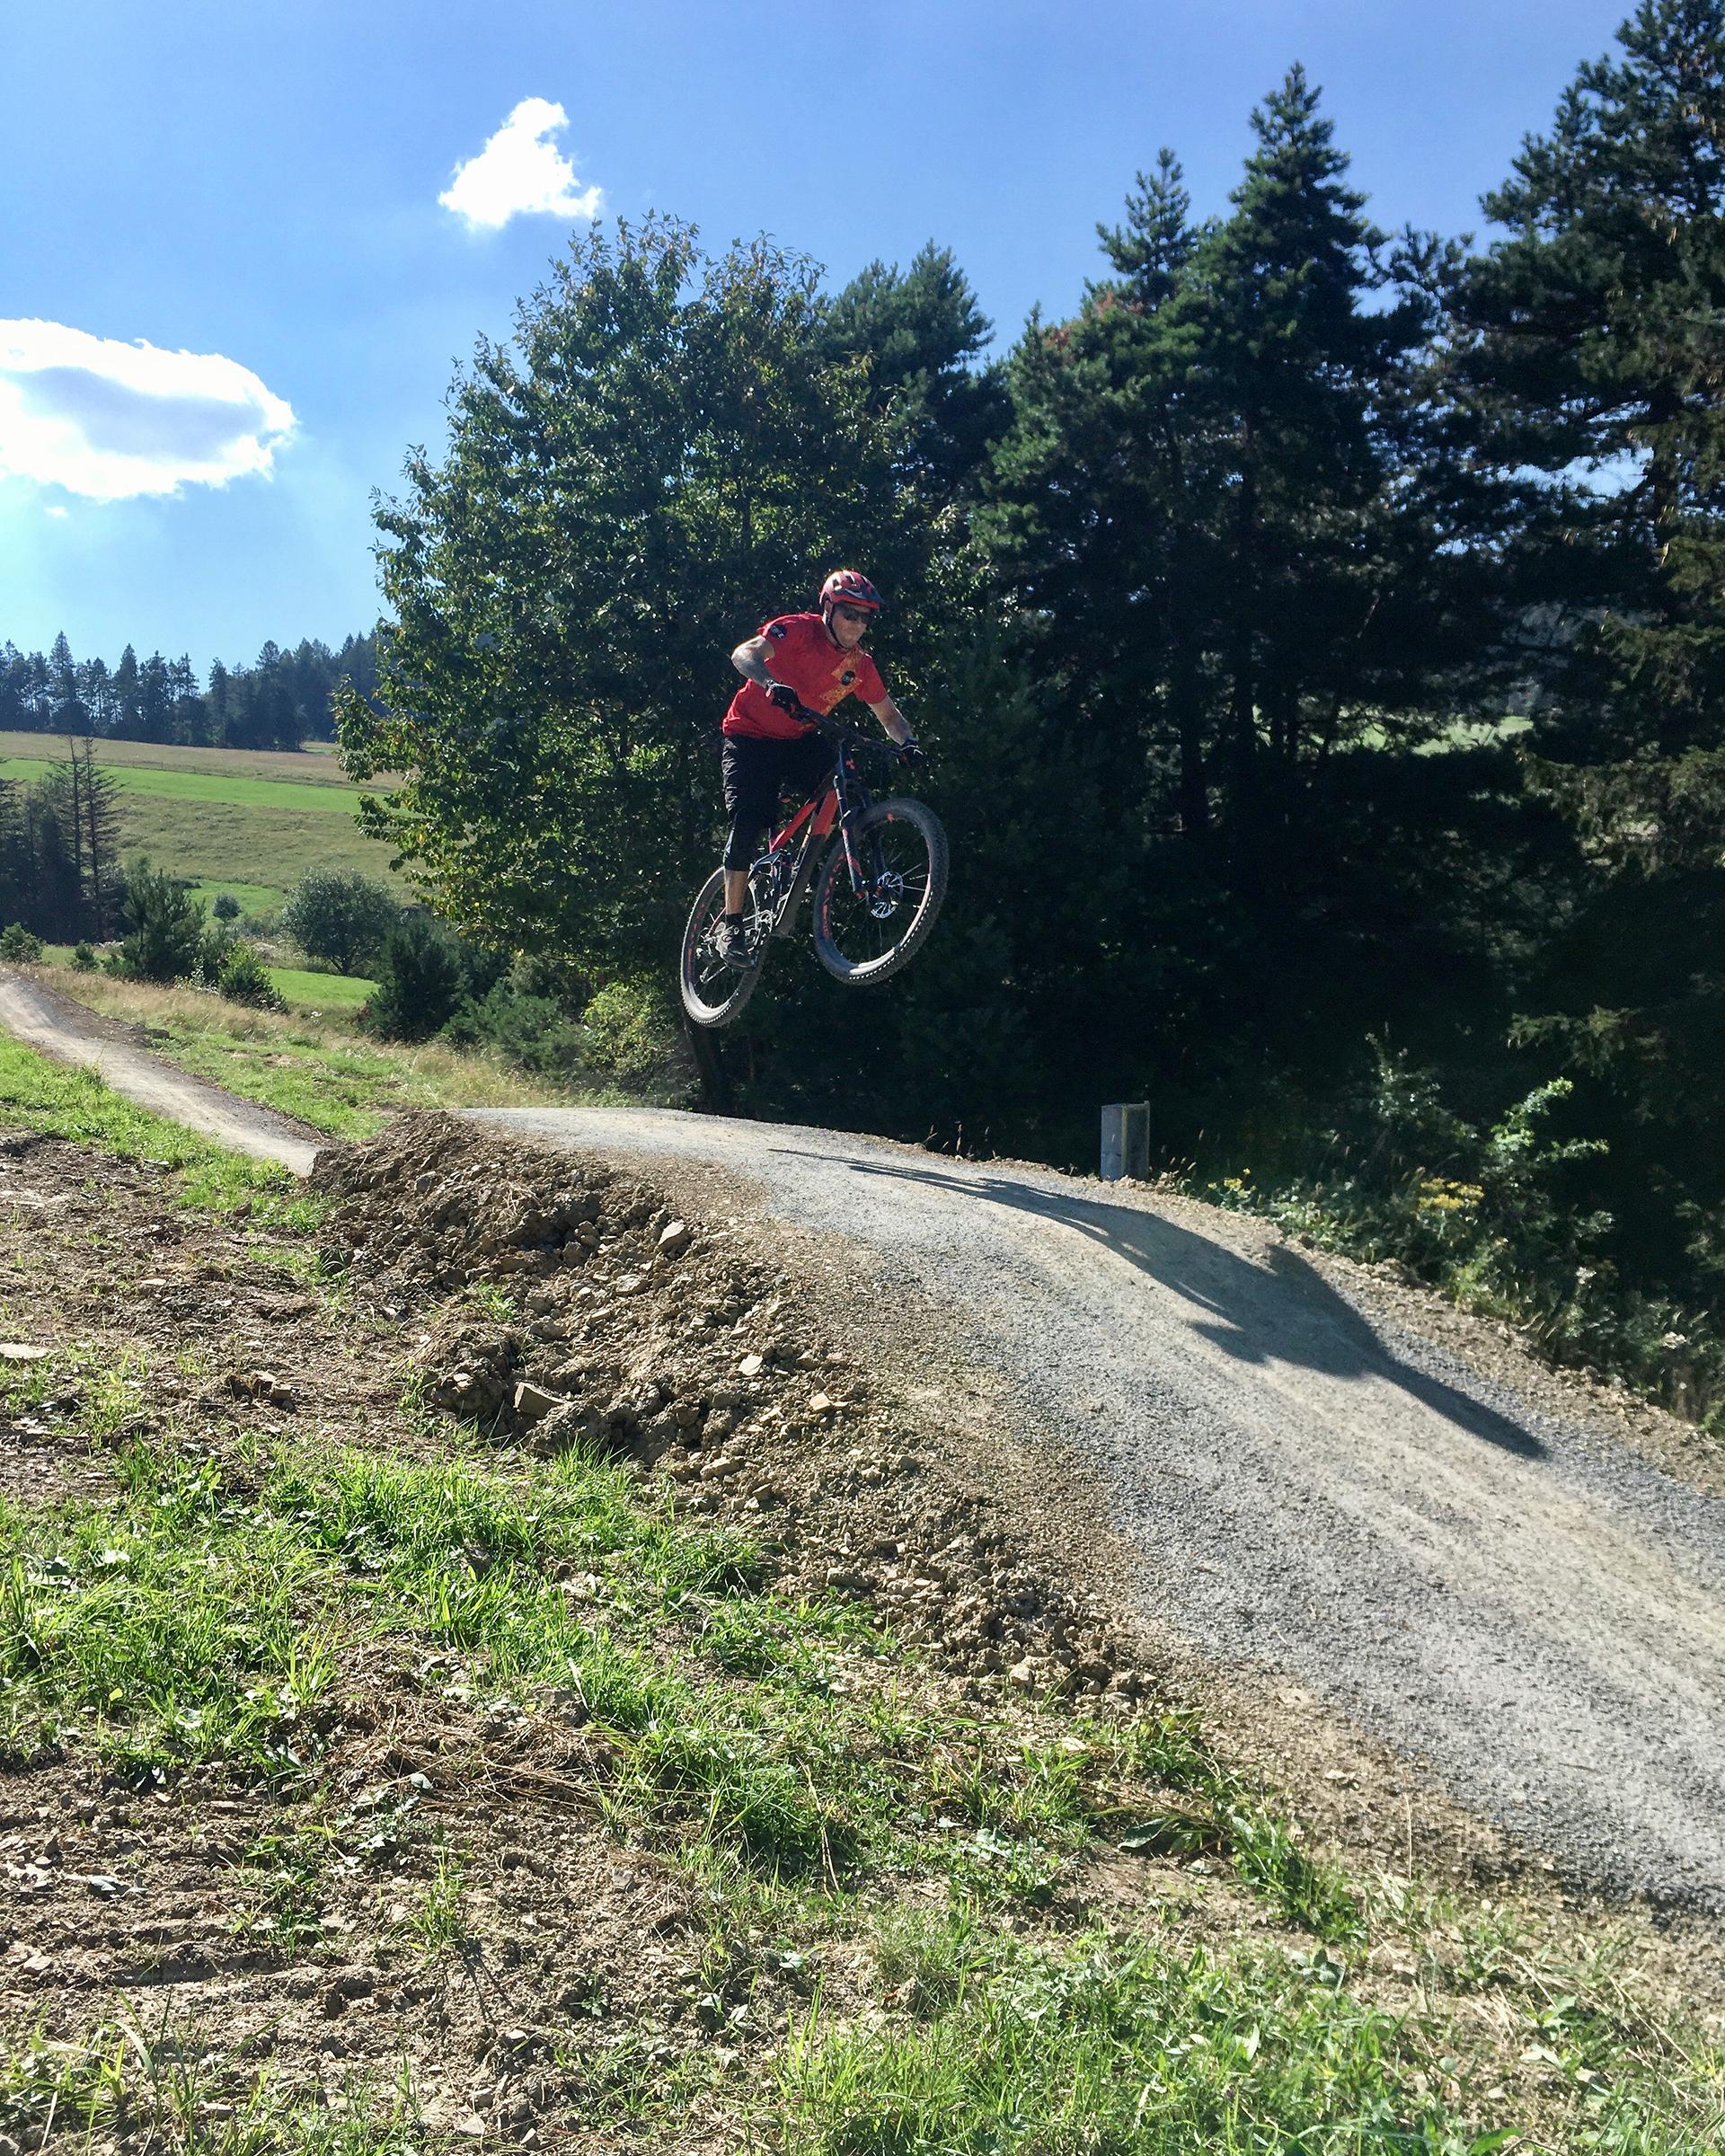 bike-park-słotwiny-arena-ebikecentrum